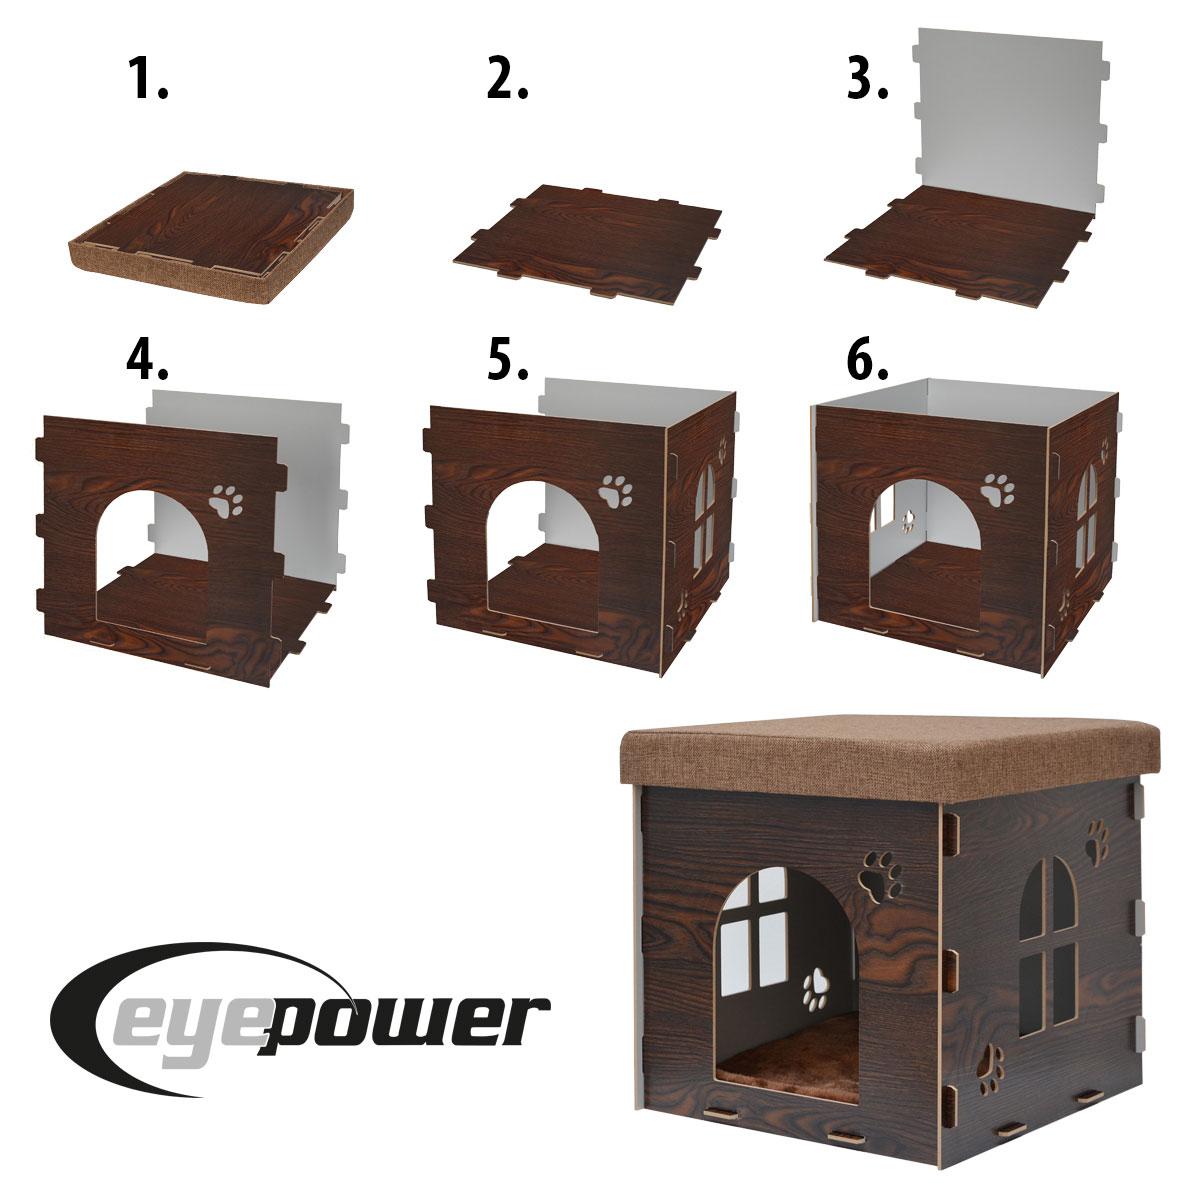 eyepower stabile katzenh hle sitzhocker sitzw rfel inkl. Black Bedroom Furniture Sets. Home Design Ideas